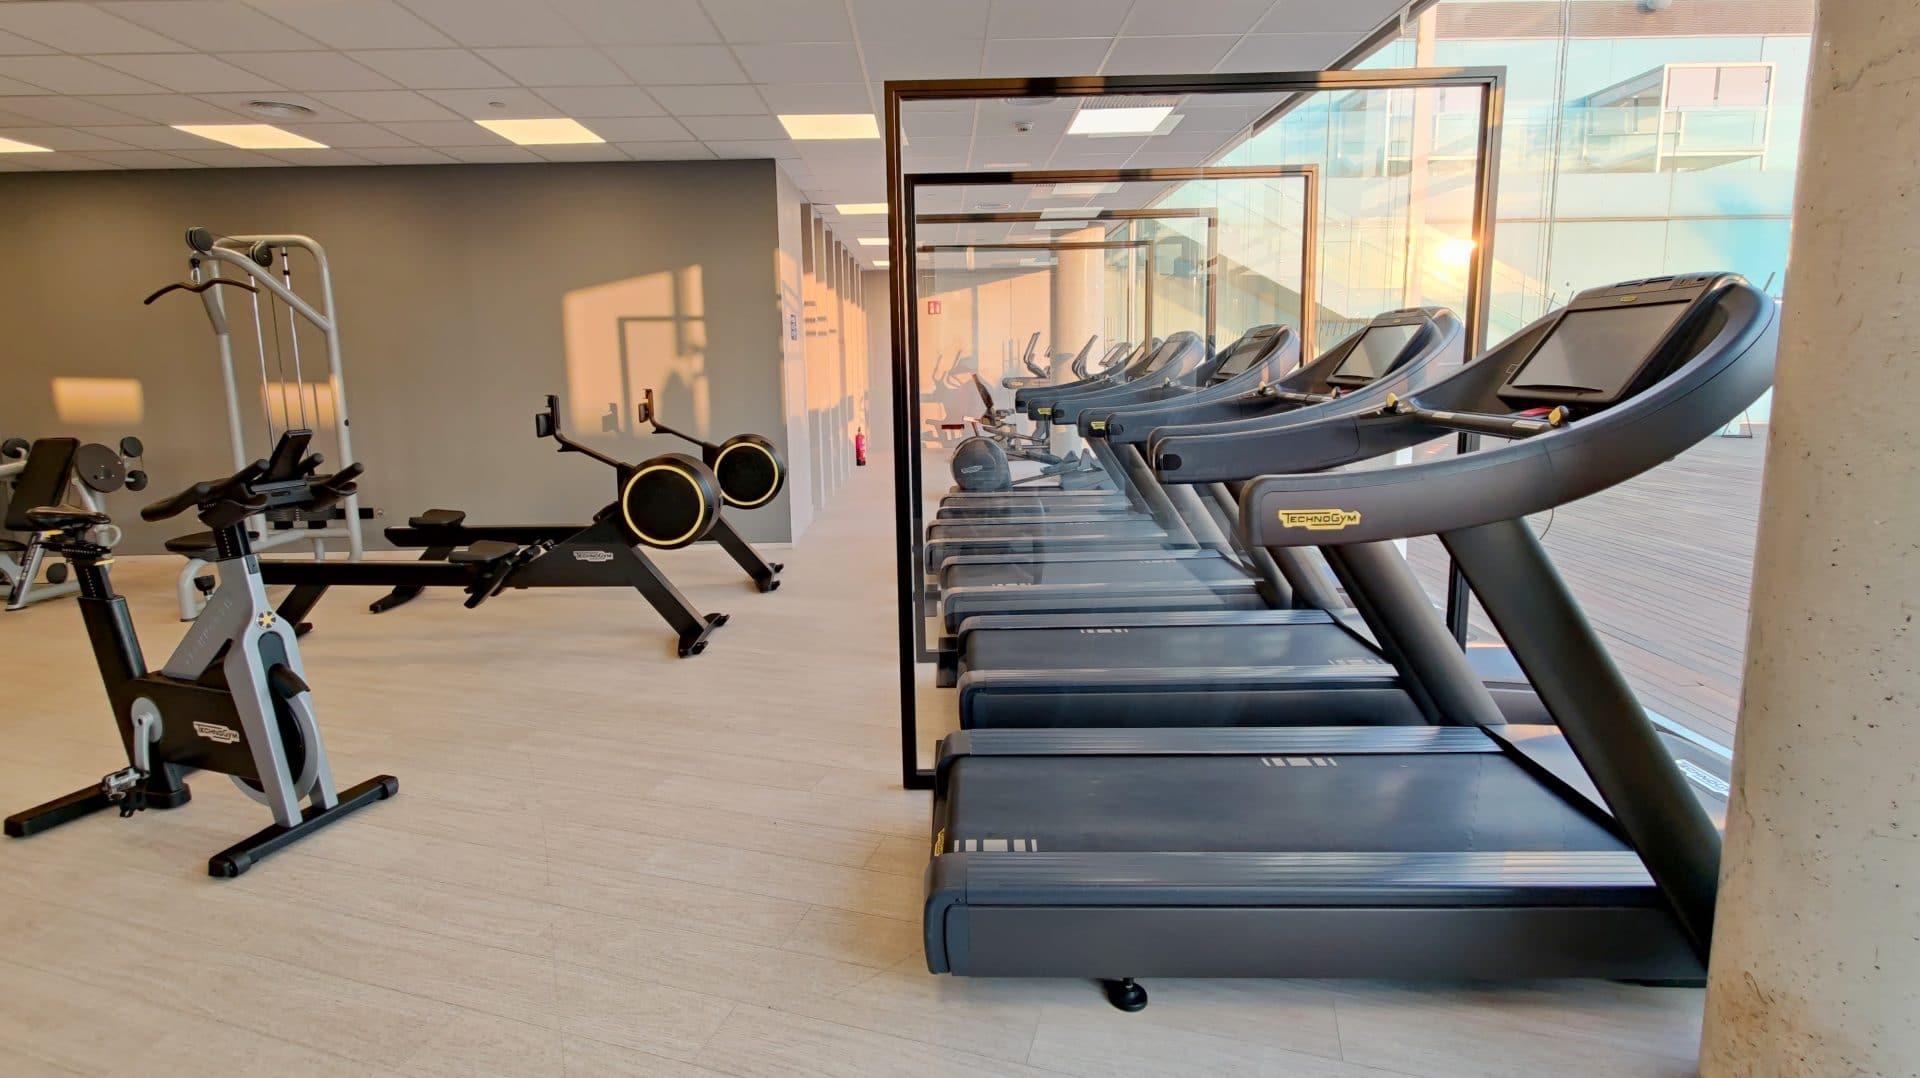 W Barcelona Fitness Cardiogeraete 2